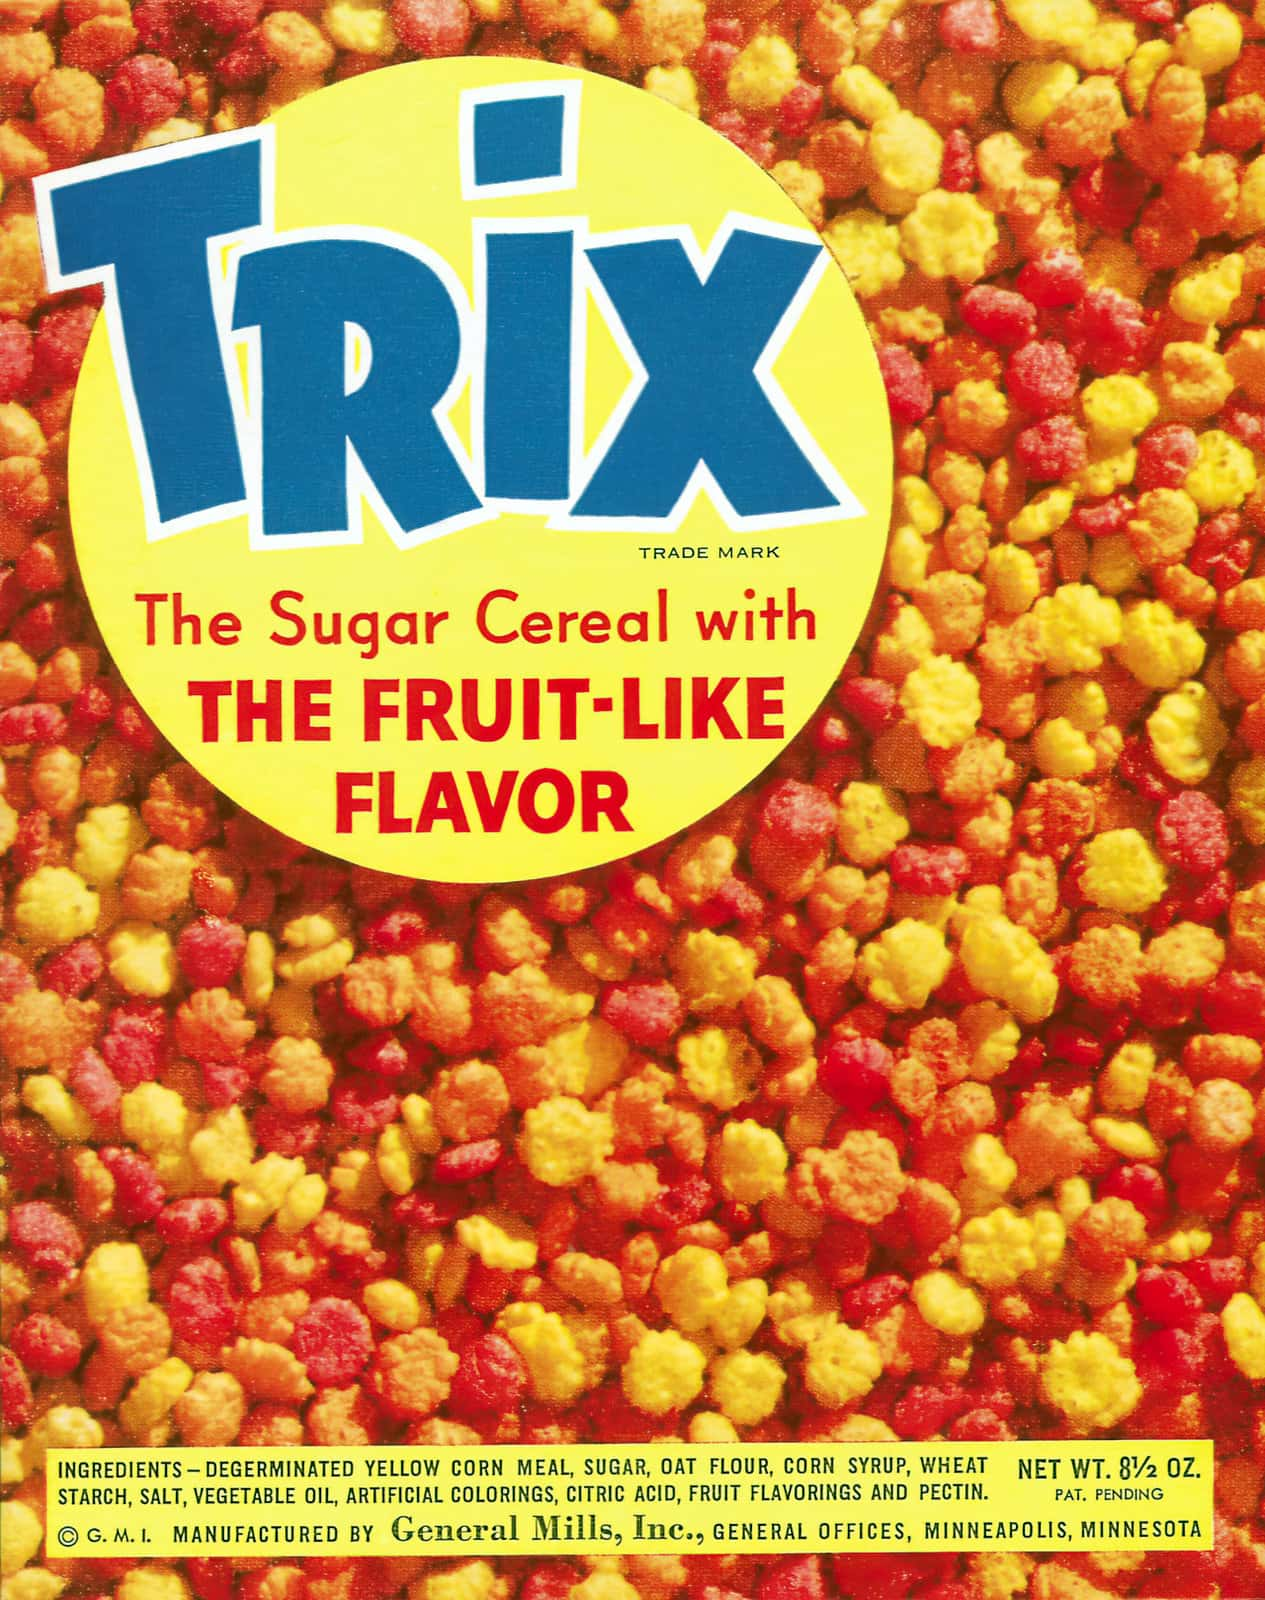 Vintage 1950s Trix cereal box